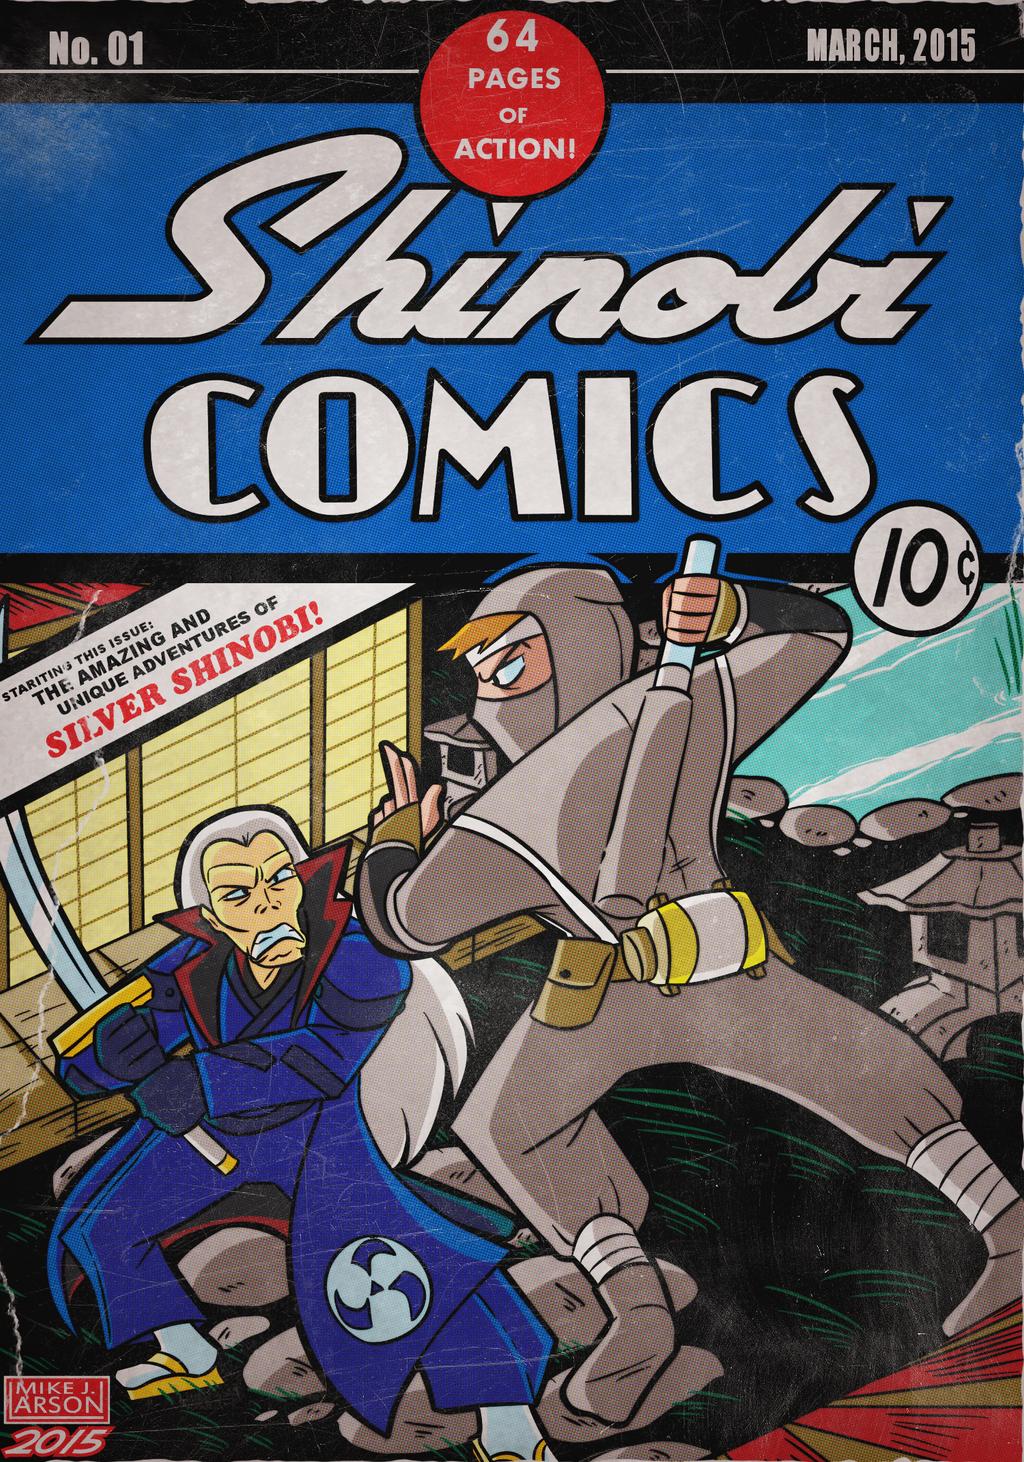 SilverKazeNinja Cover Commission: Silver Shinobi by MichaelJLarson